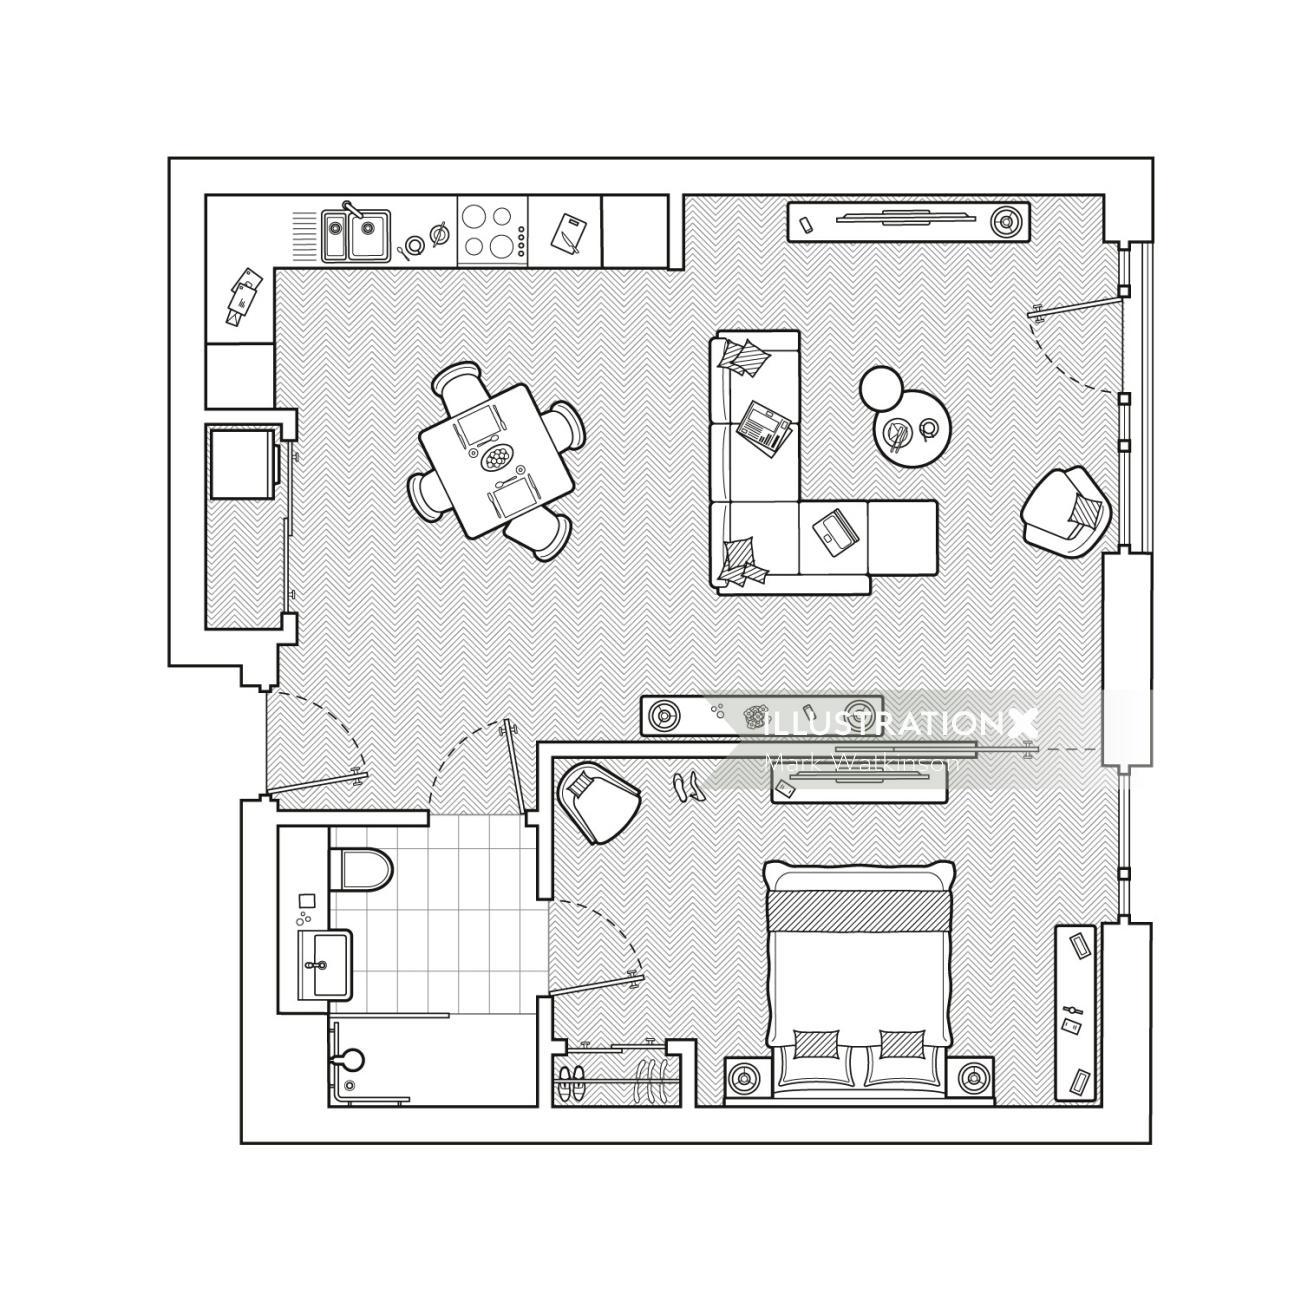 Architecture design of single bedroom